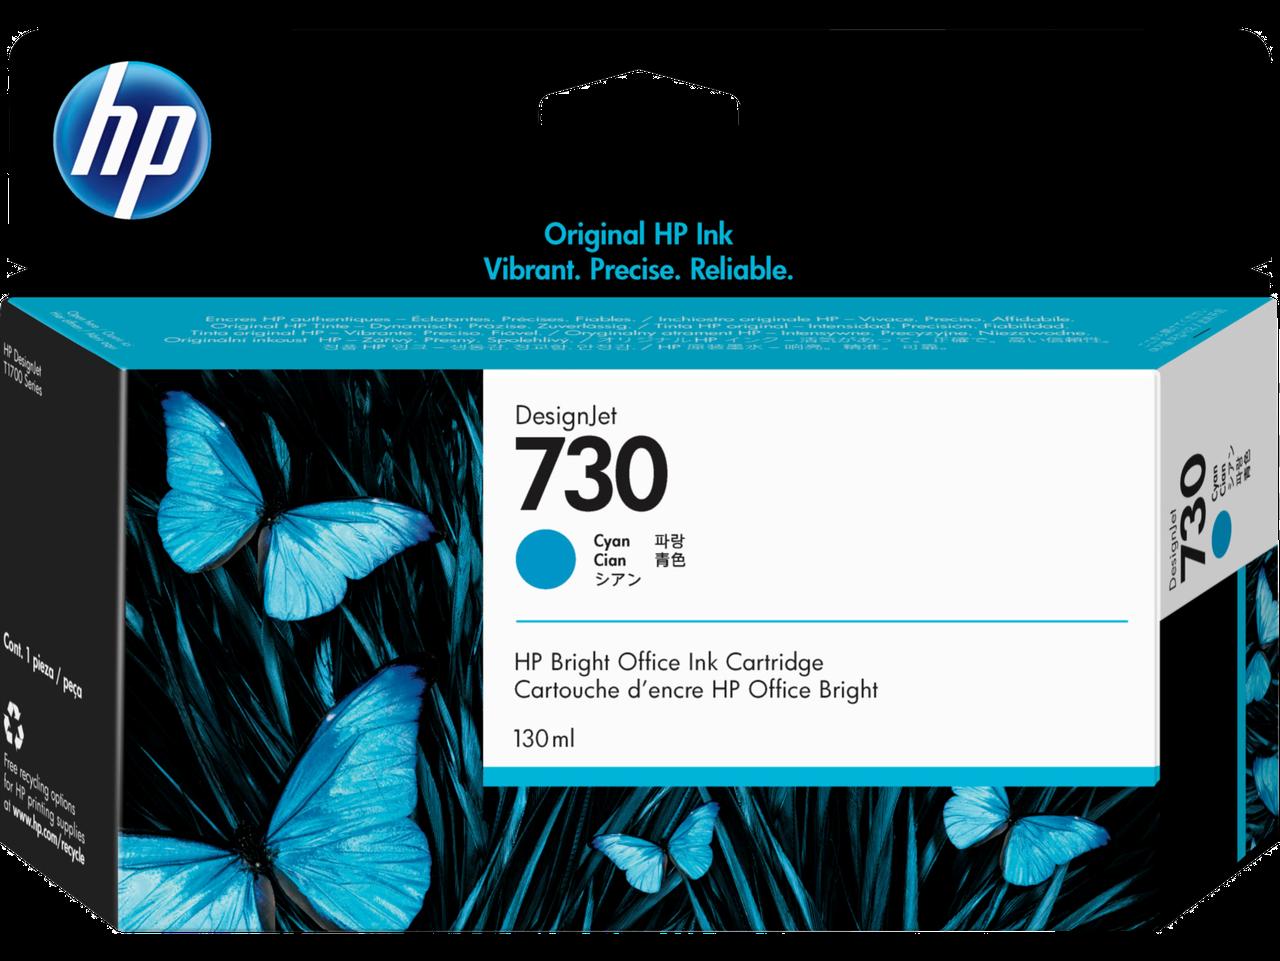 HP P2V62A Картридж голубой HP 730 Cyan Ink Cartridge for DesignJet T1700, 130 ml.